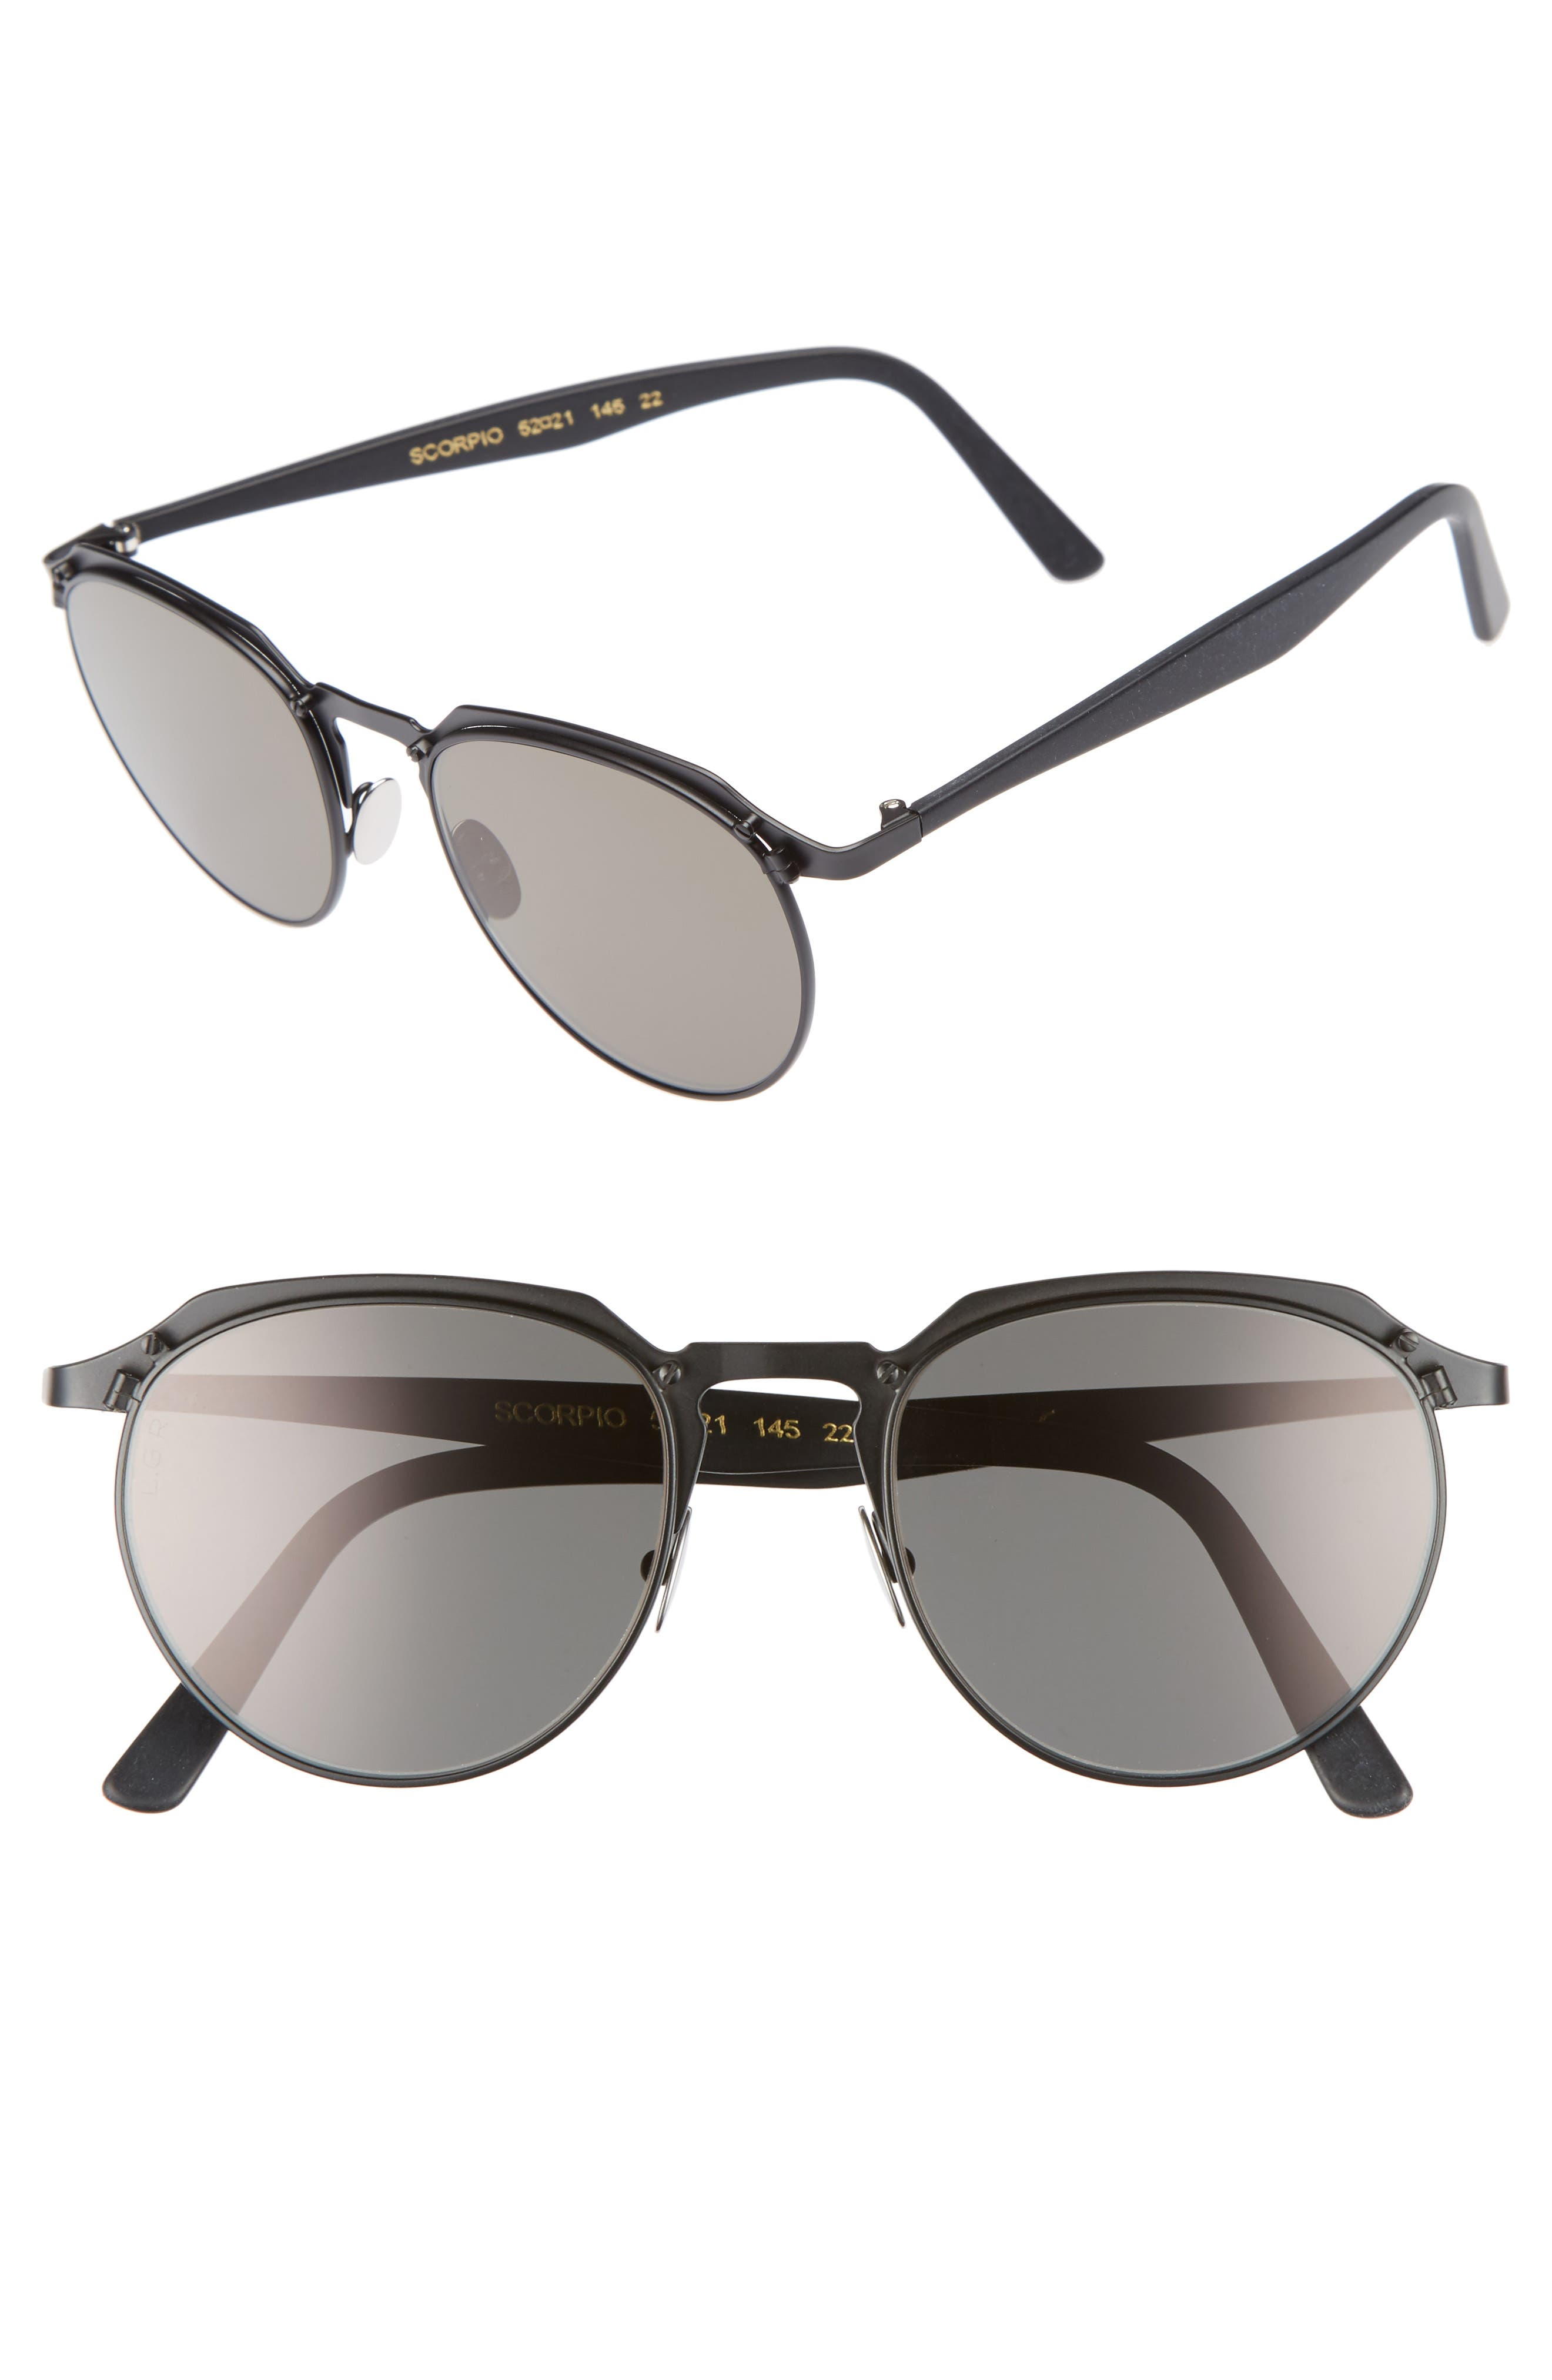 Scorpio 52mm Sunglasses,                         Main,                         color, 001